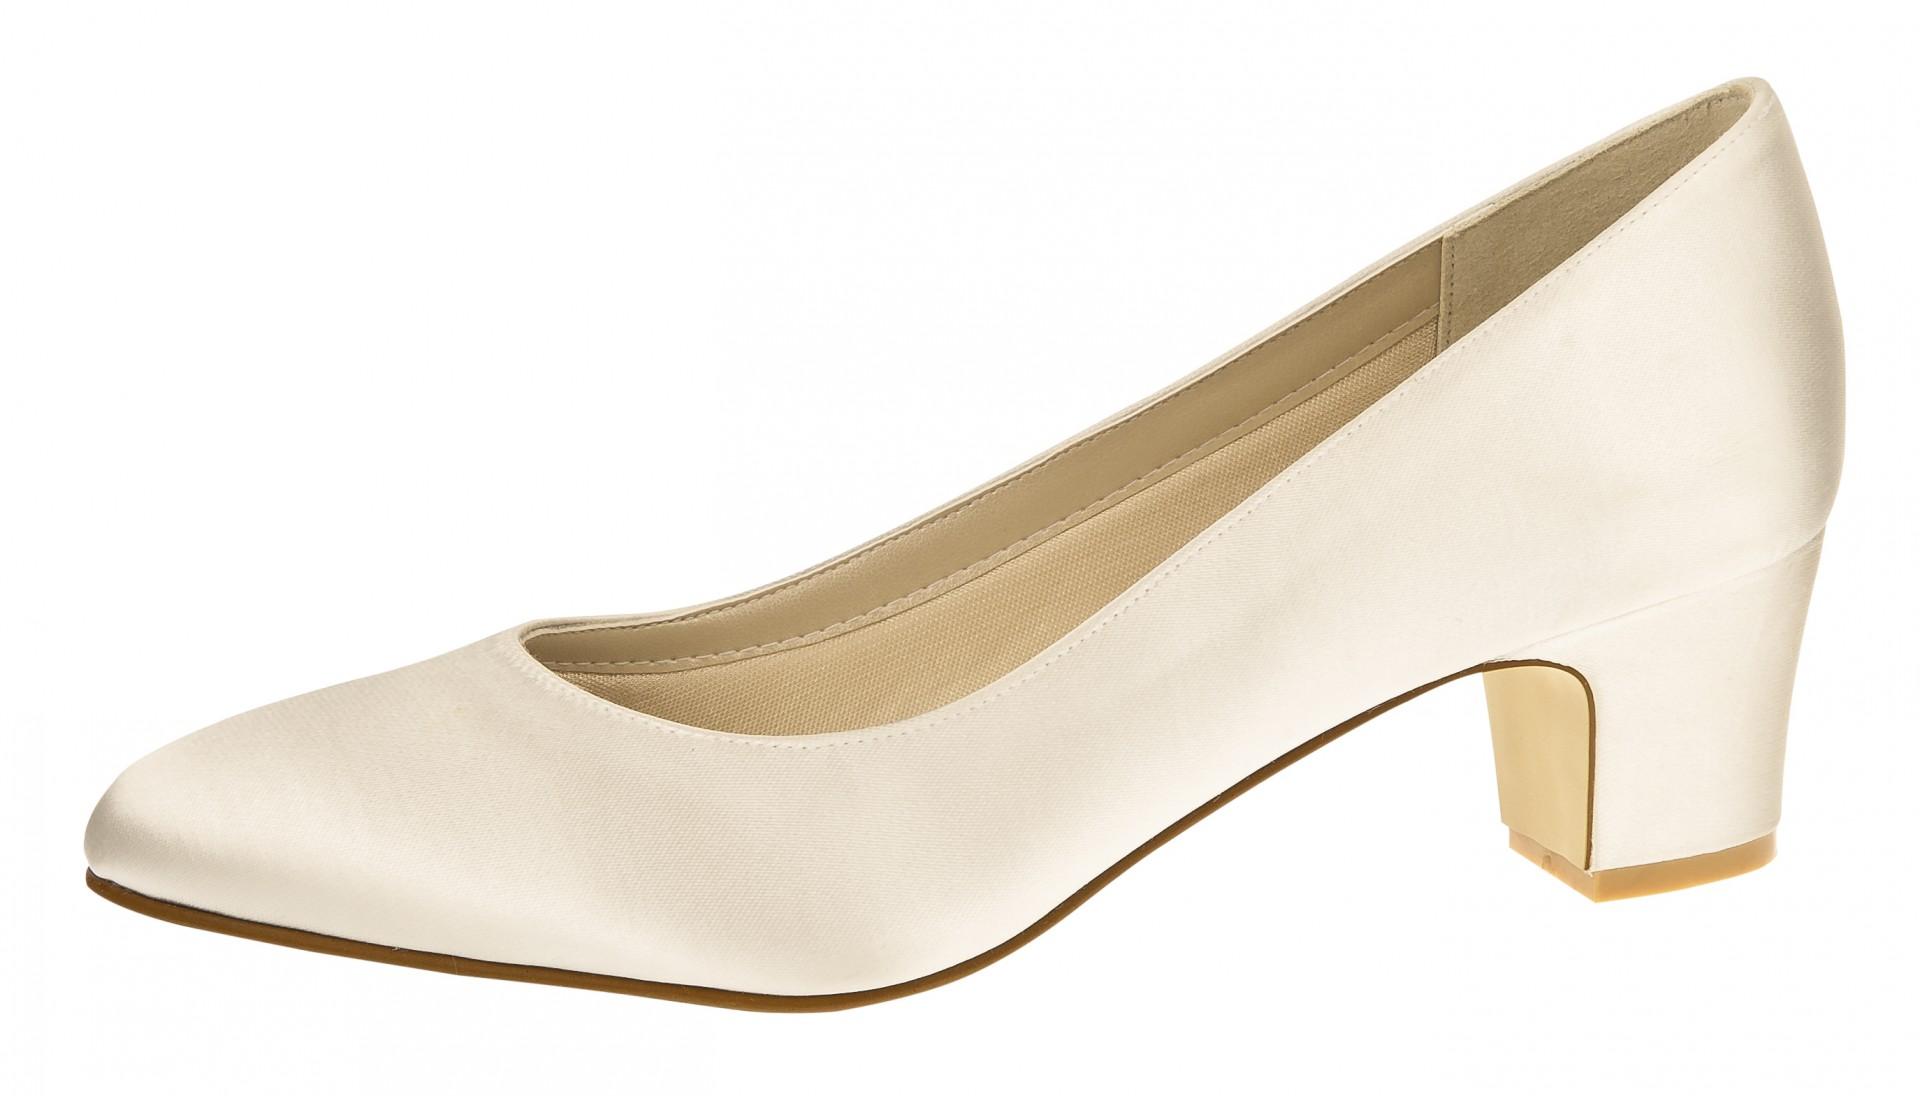 Elsa Coloured Shoes: Stephanie